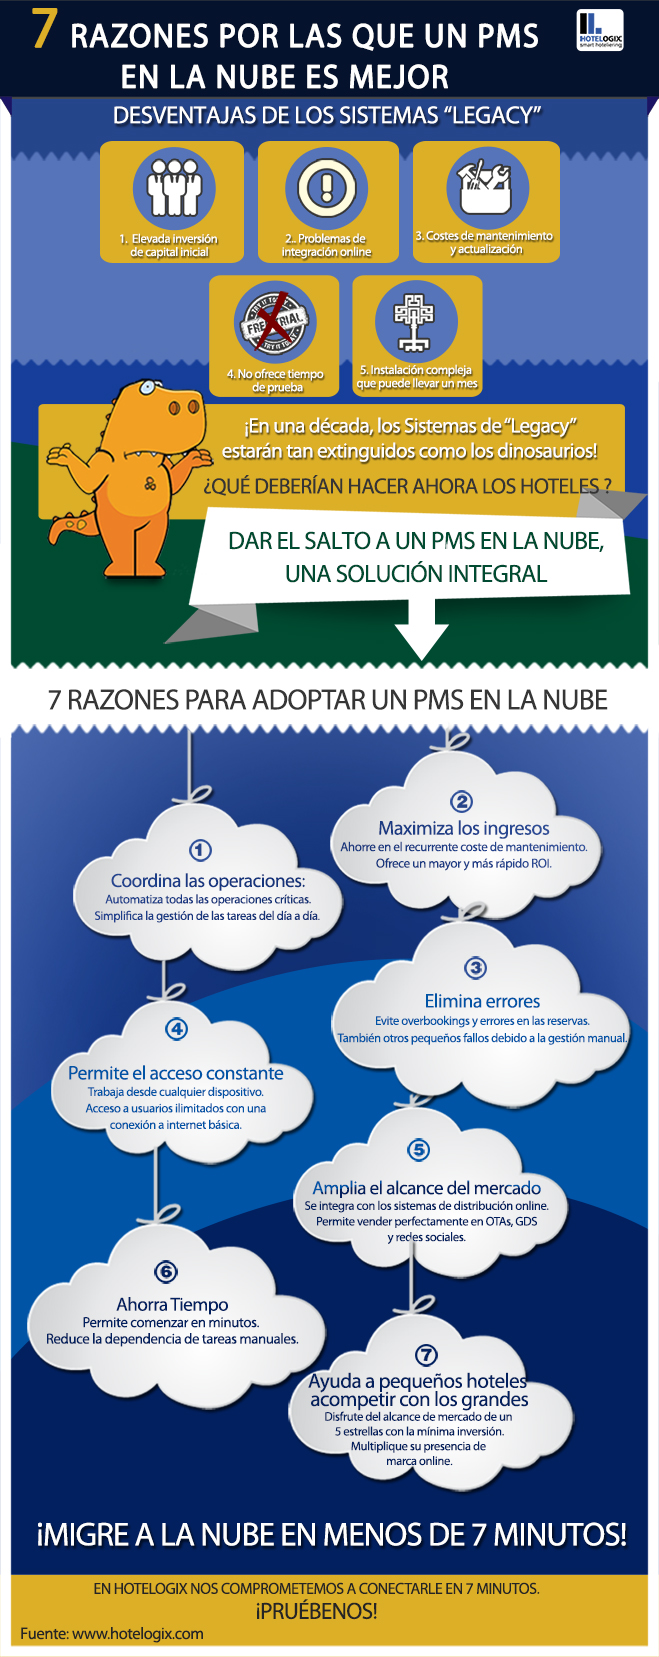 Sistemas en la nube vs sistemas tradicionales